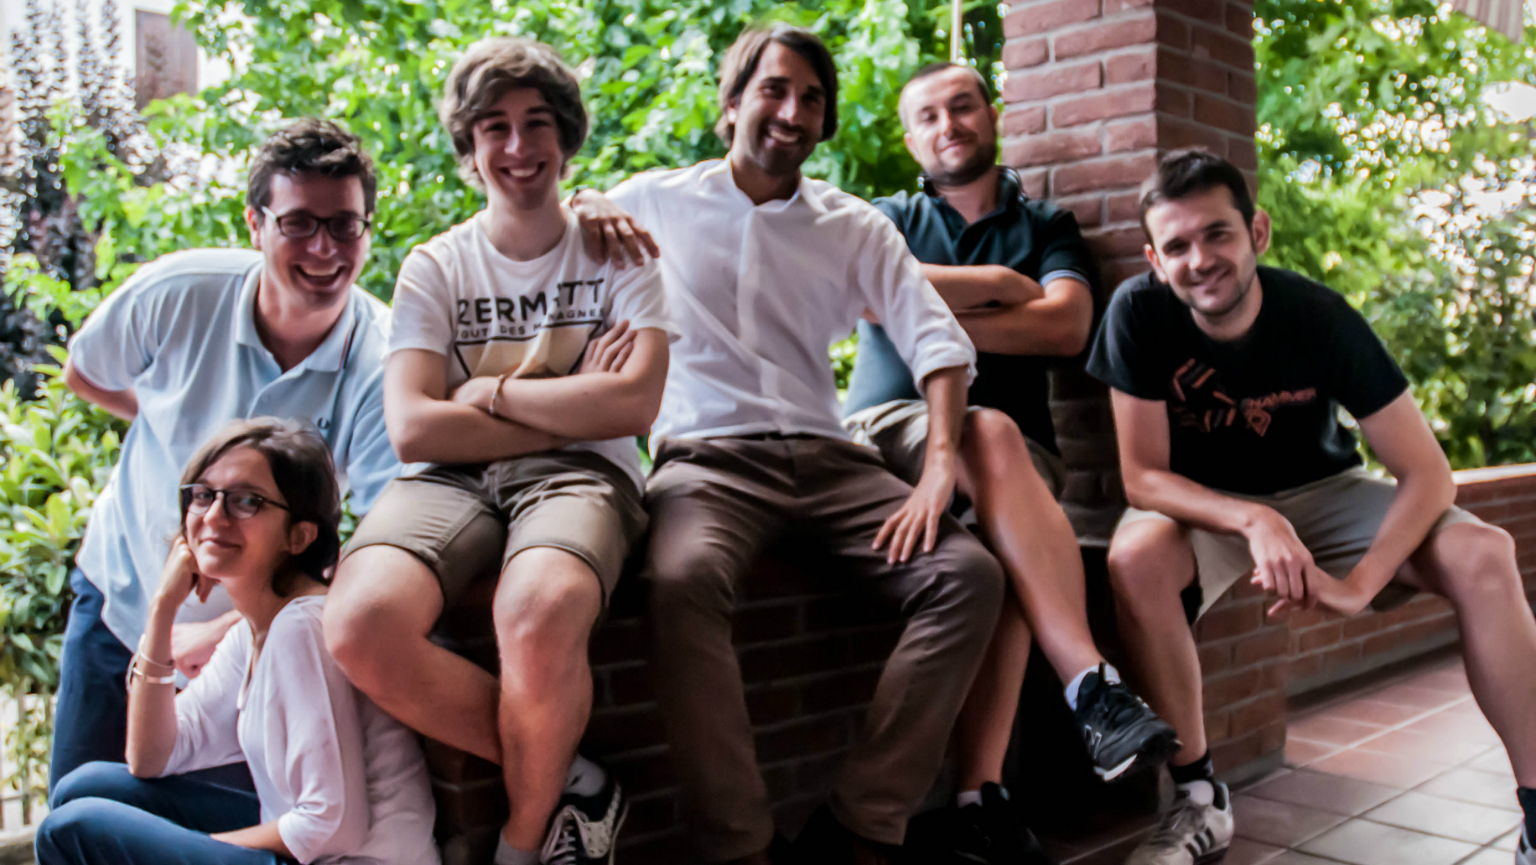 Internazionalizzazione: una startup italiana all'Unbound Digital